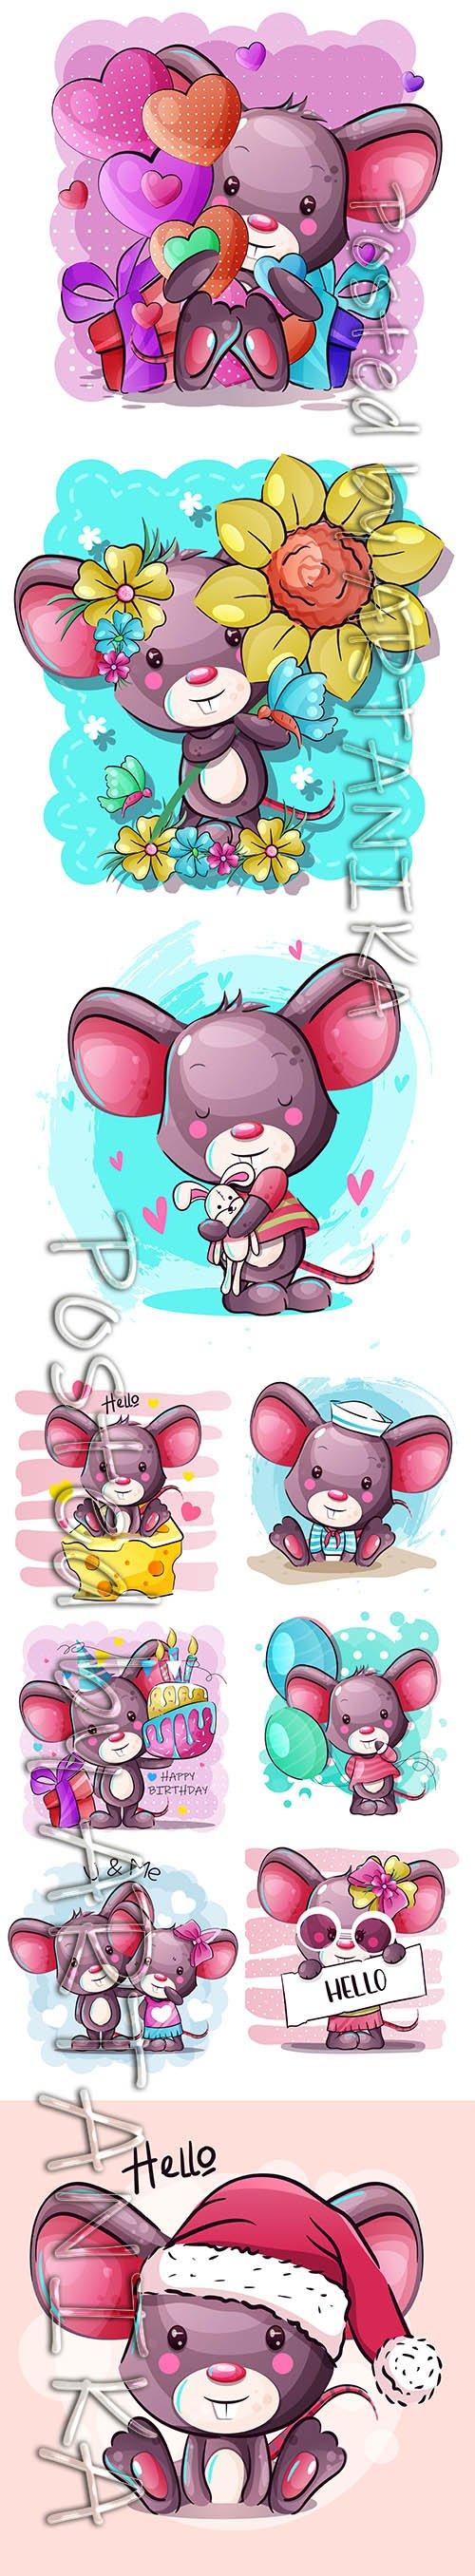 Cute Cartoon Mouse Hand-Draw Illustrations Set